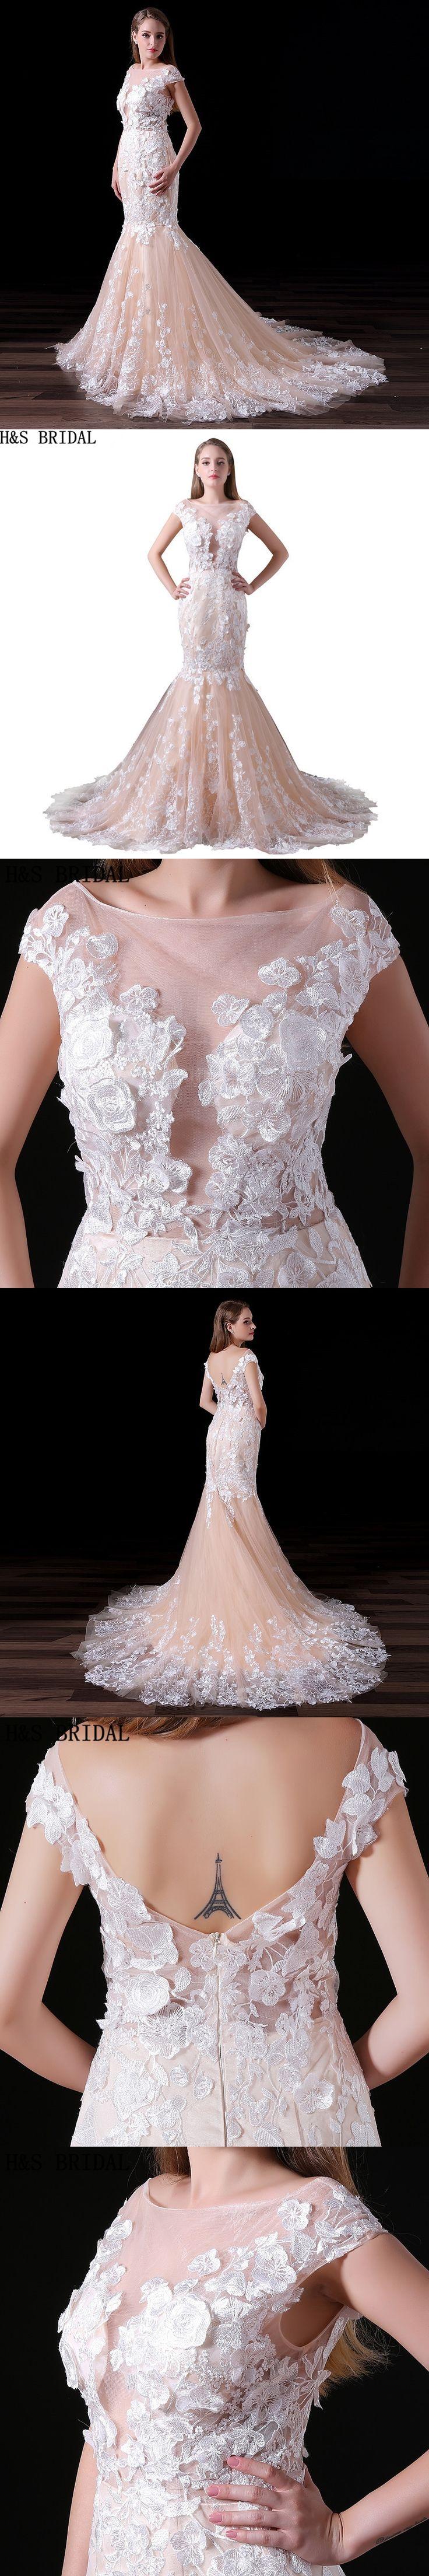 H&S BRIDAL Mermaid Wedding Dresses Cap sleeves Lace Wedding Dress 2018 Champagne Wedding Gowns vestido de noiva wedding-dress